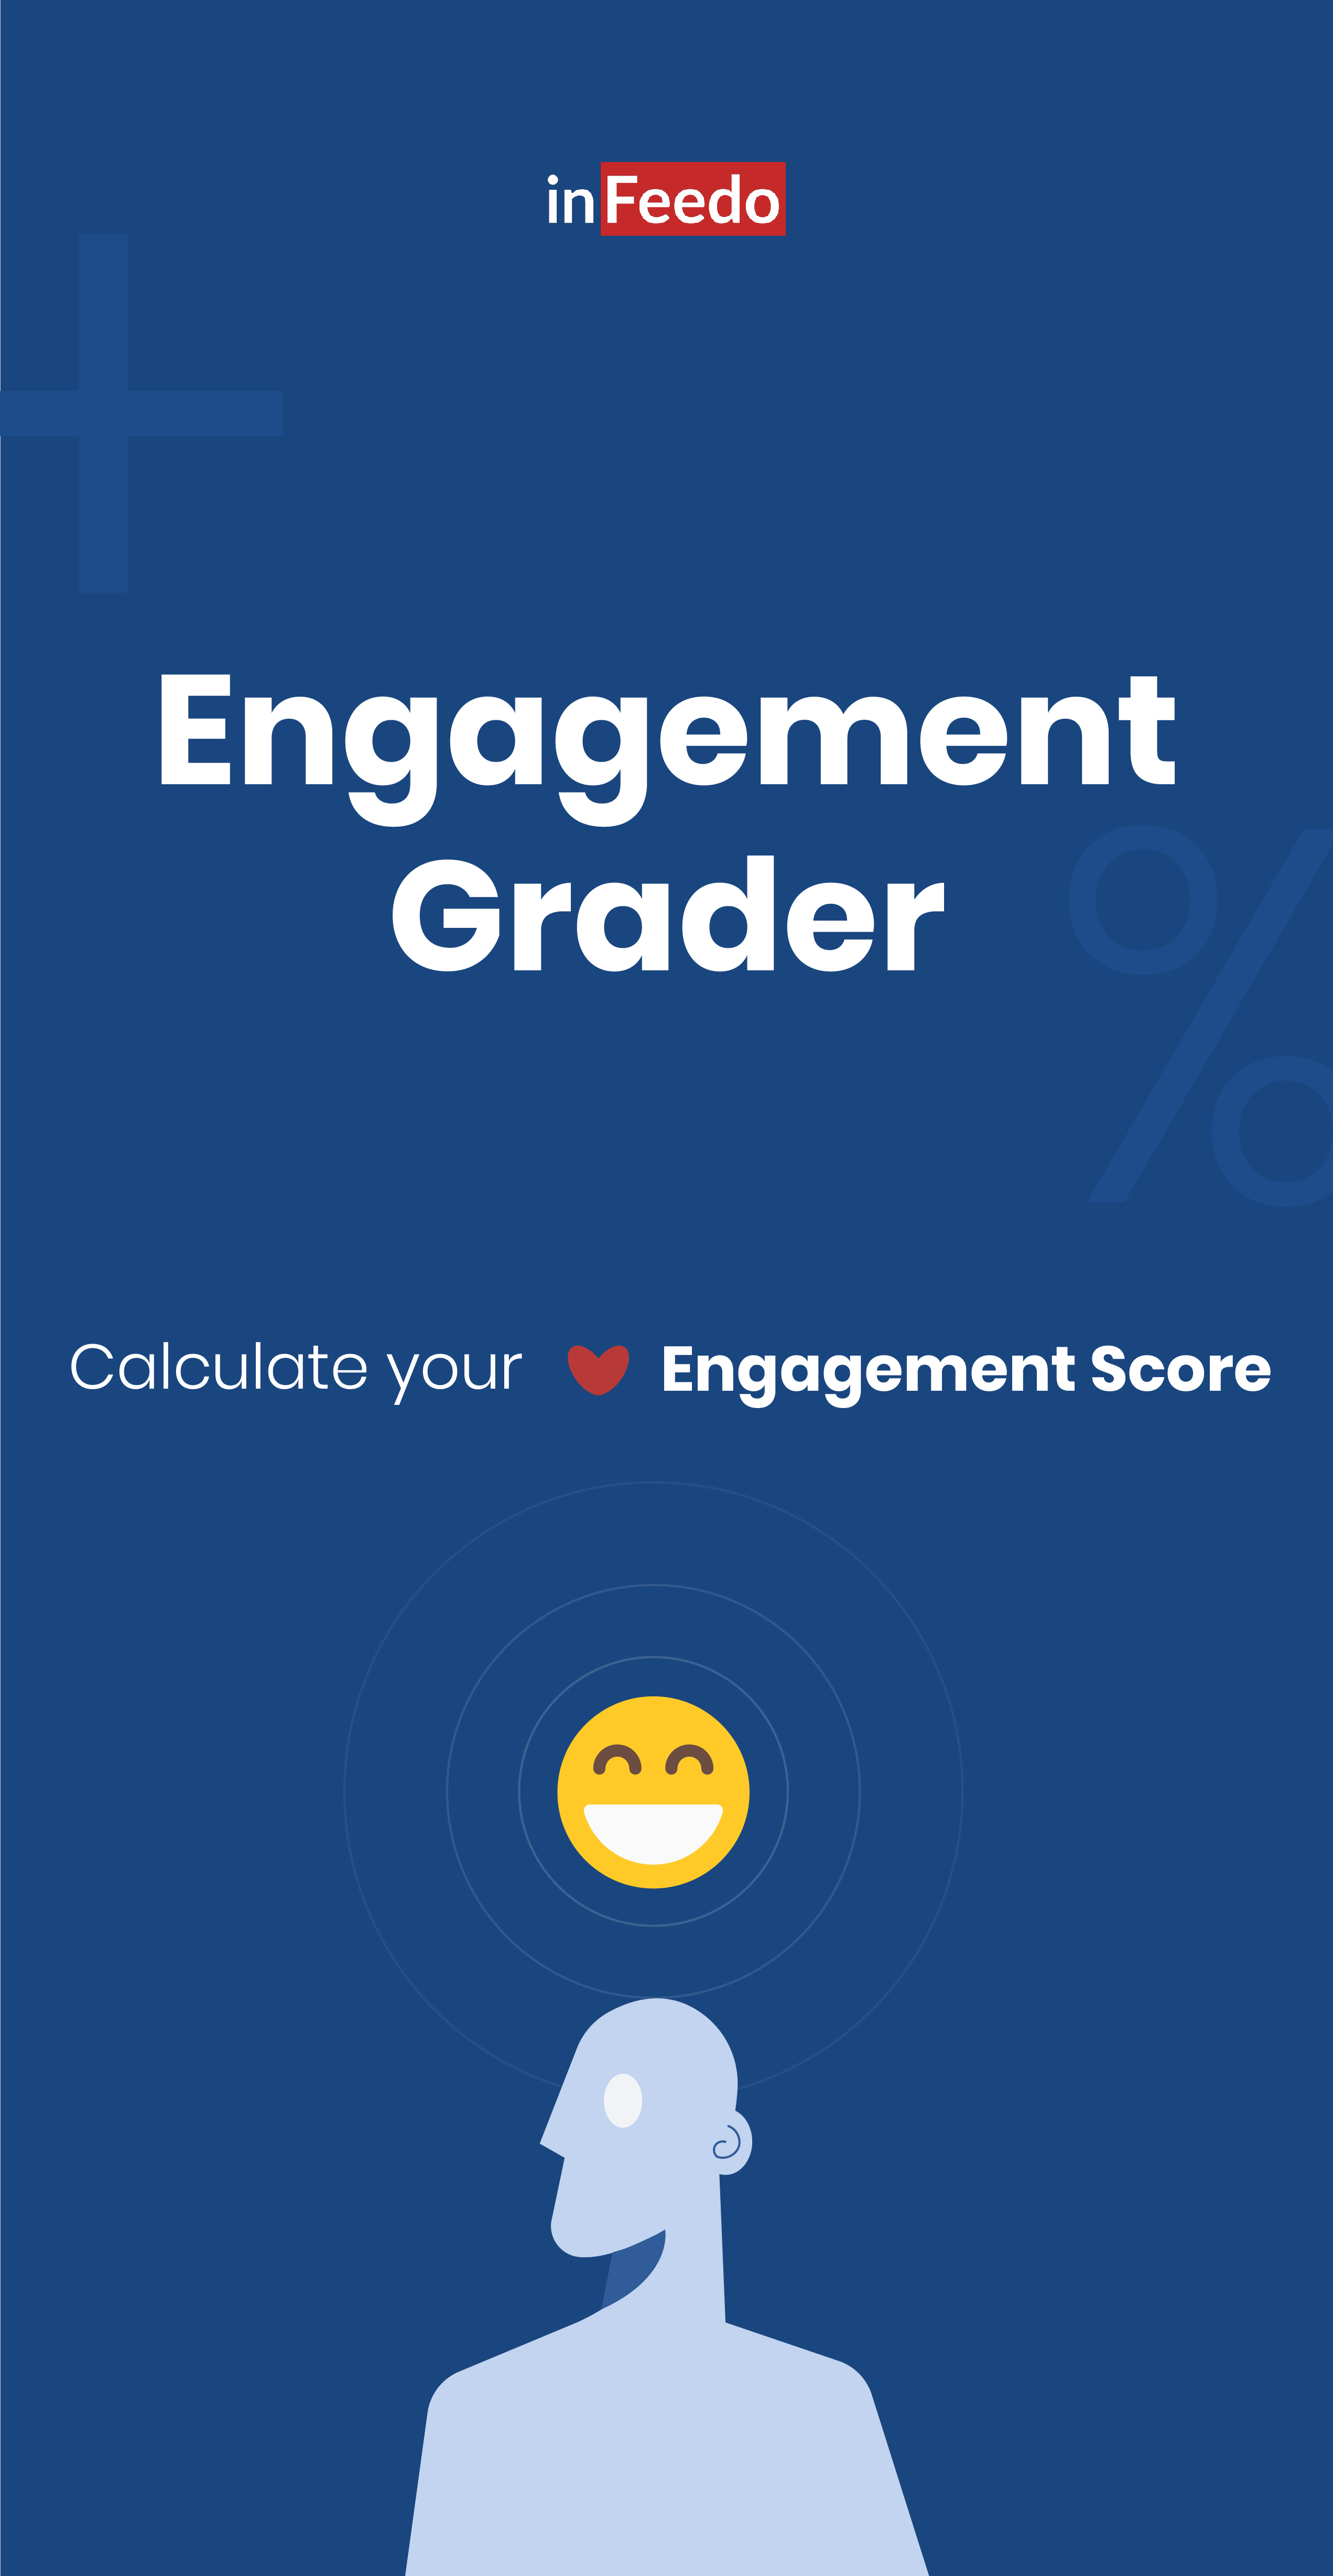 engagementgraderlandingpageV.1-02